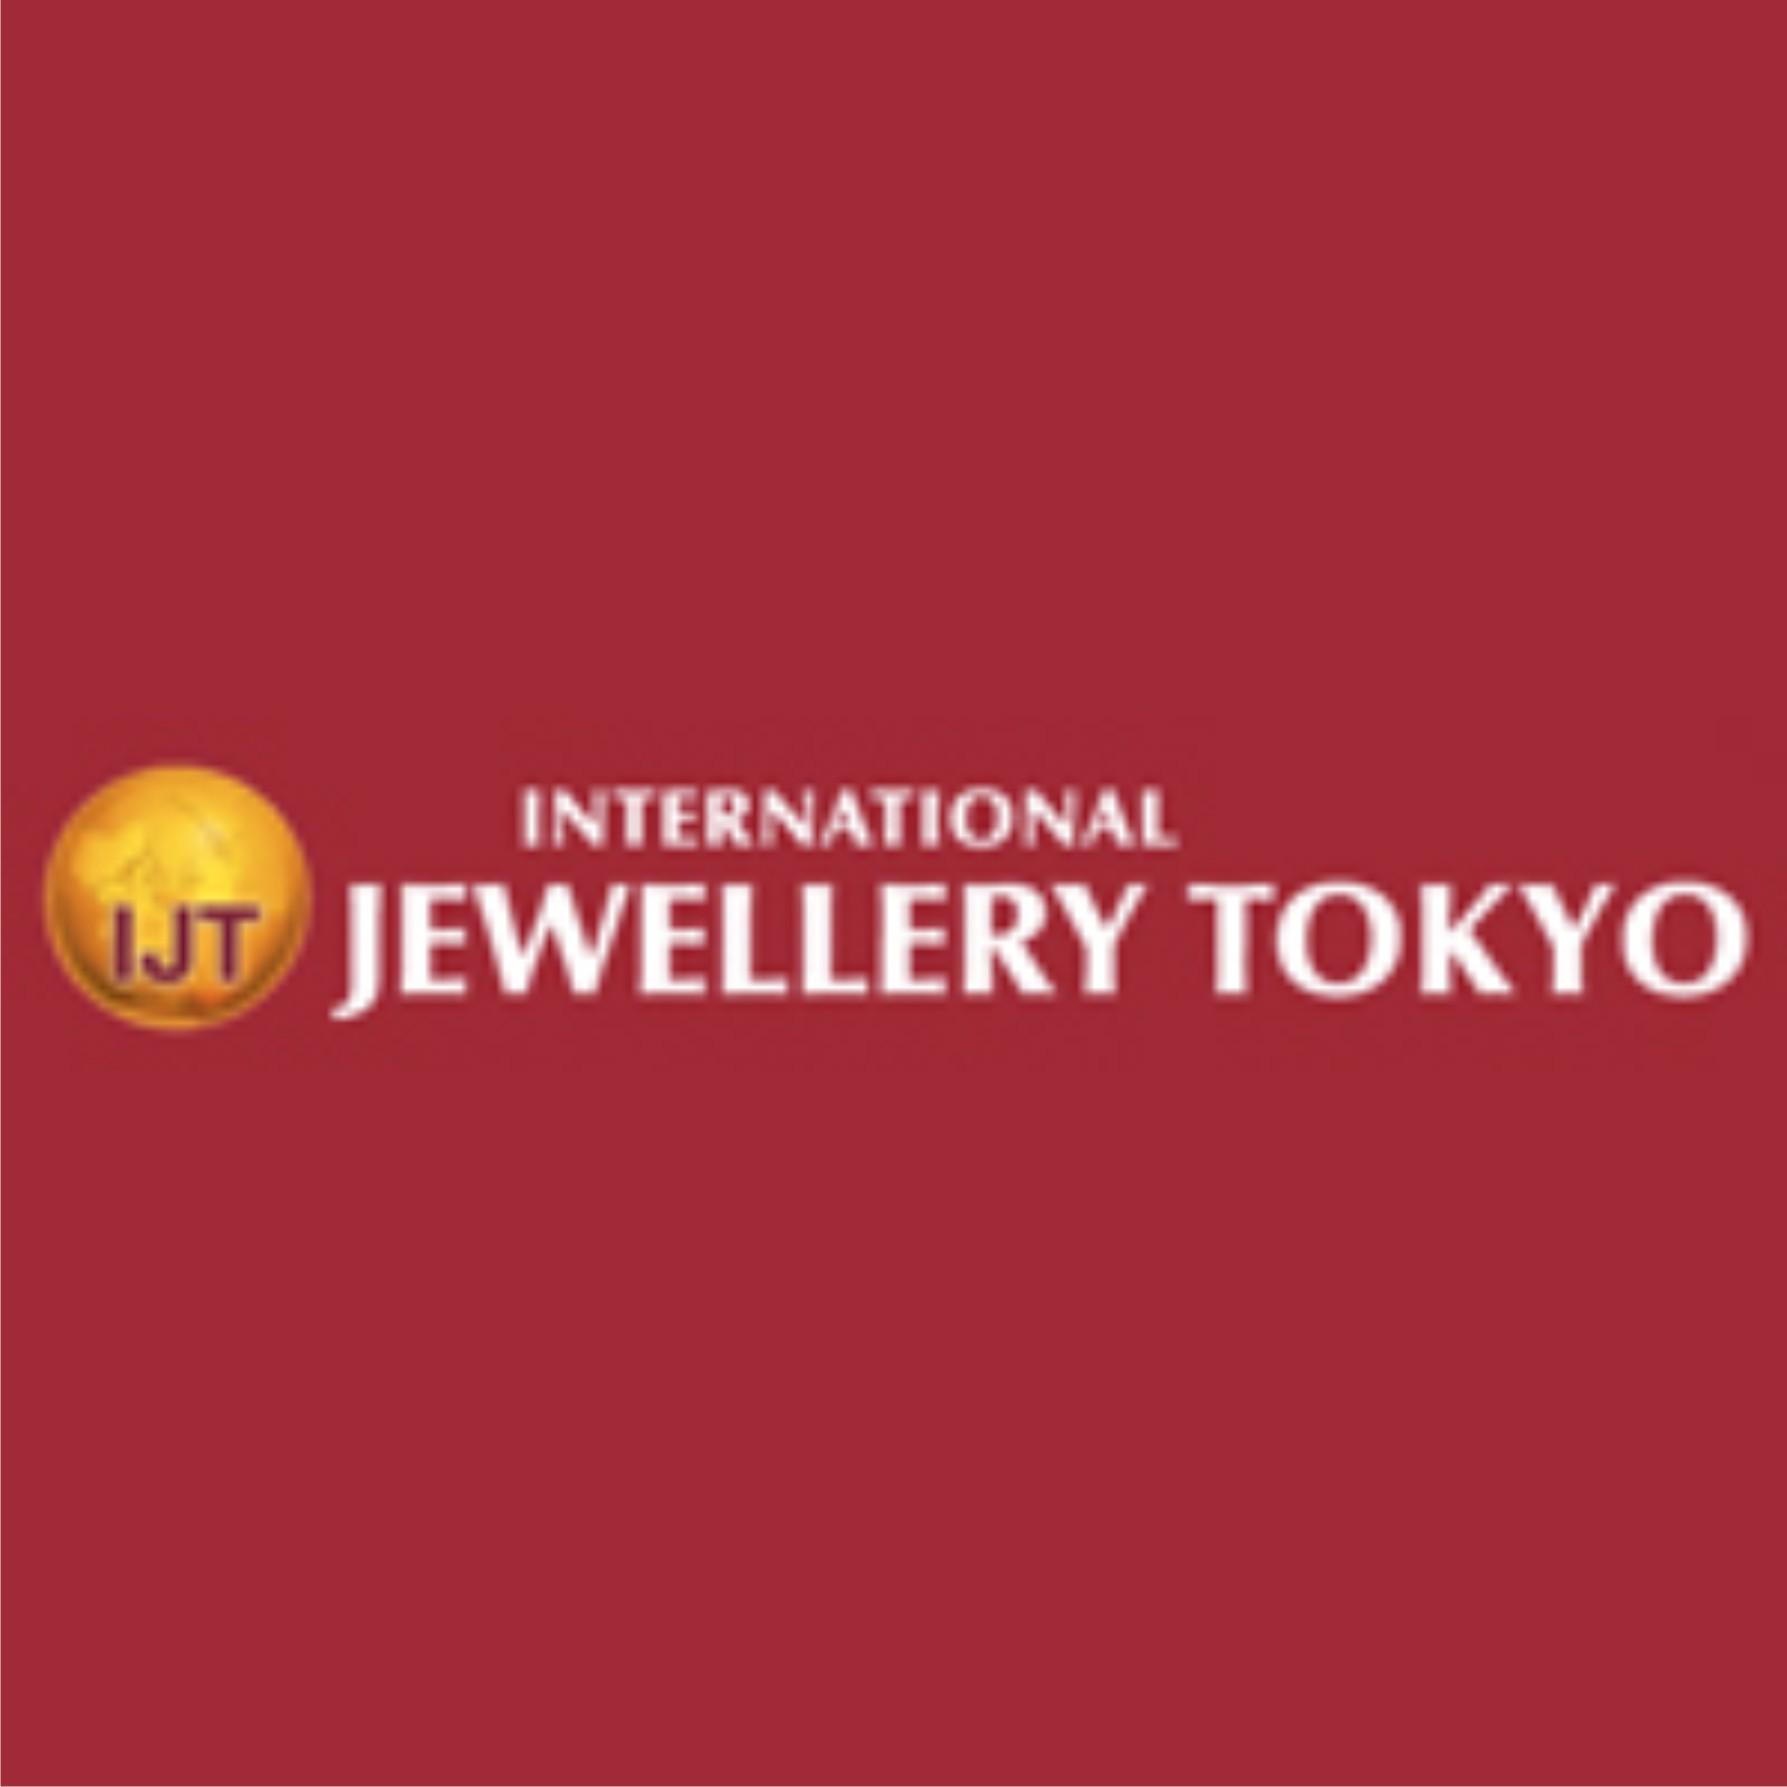 ijt international jewellery tokyo